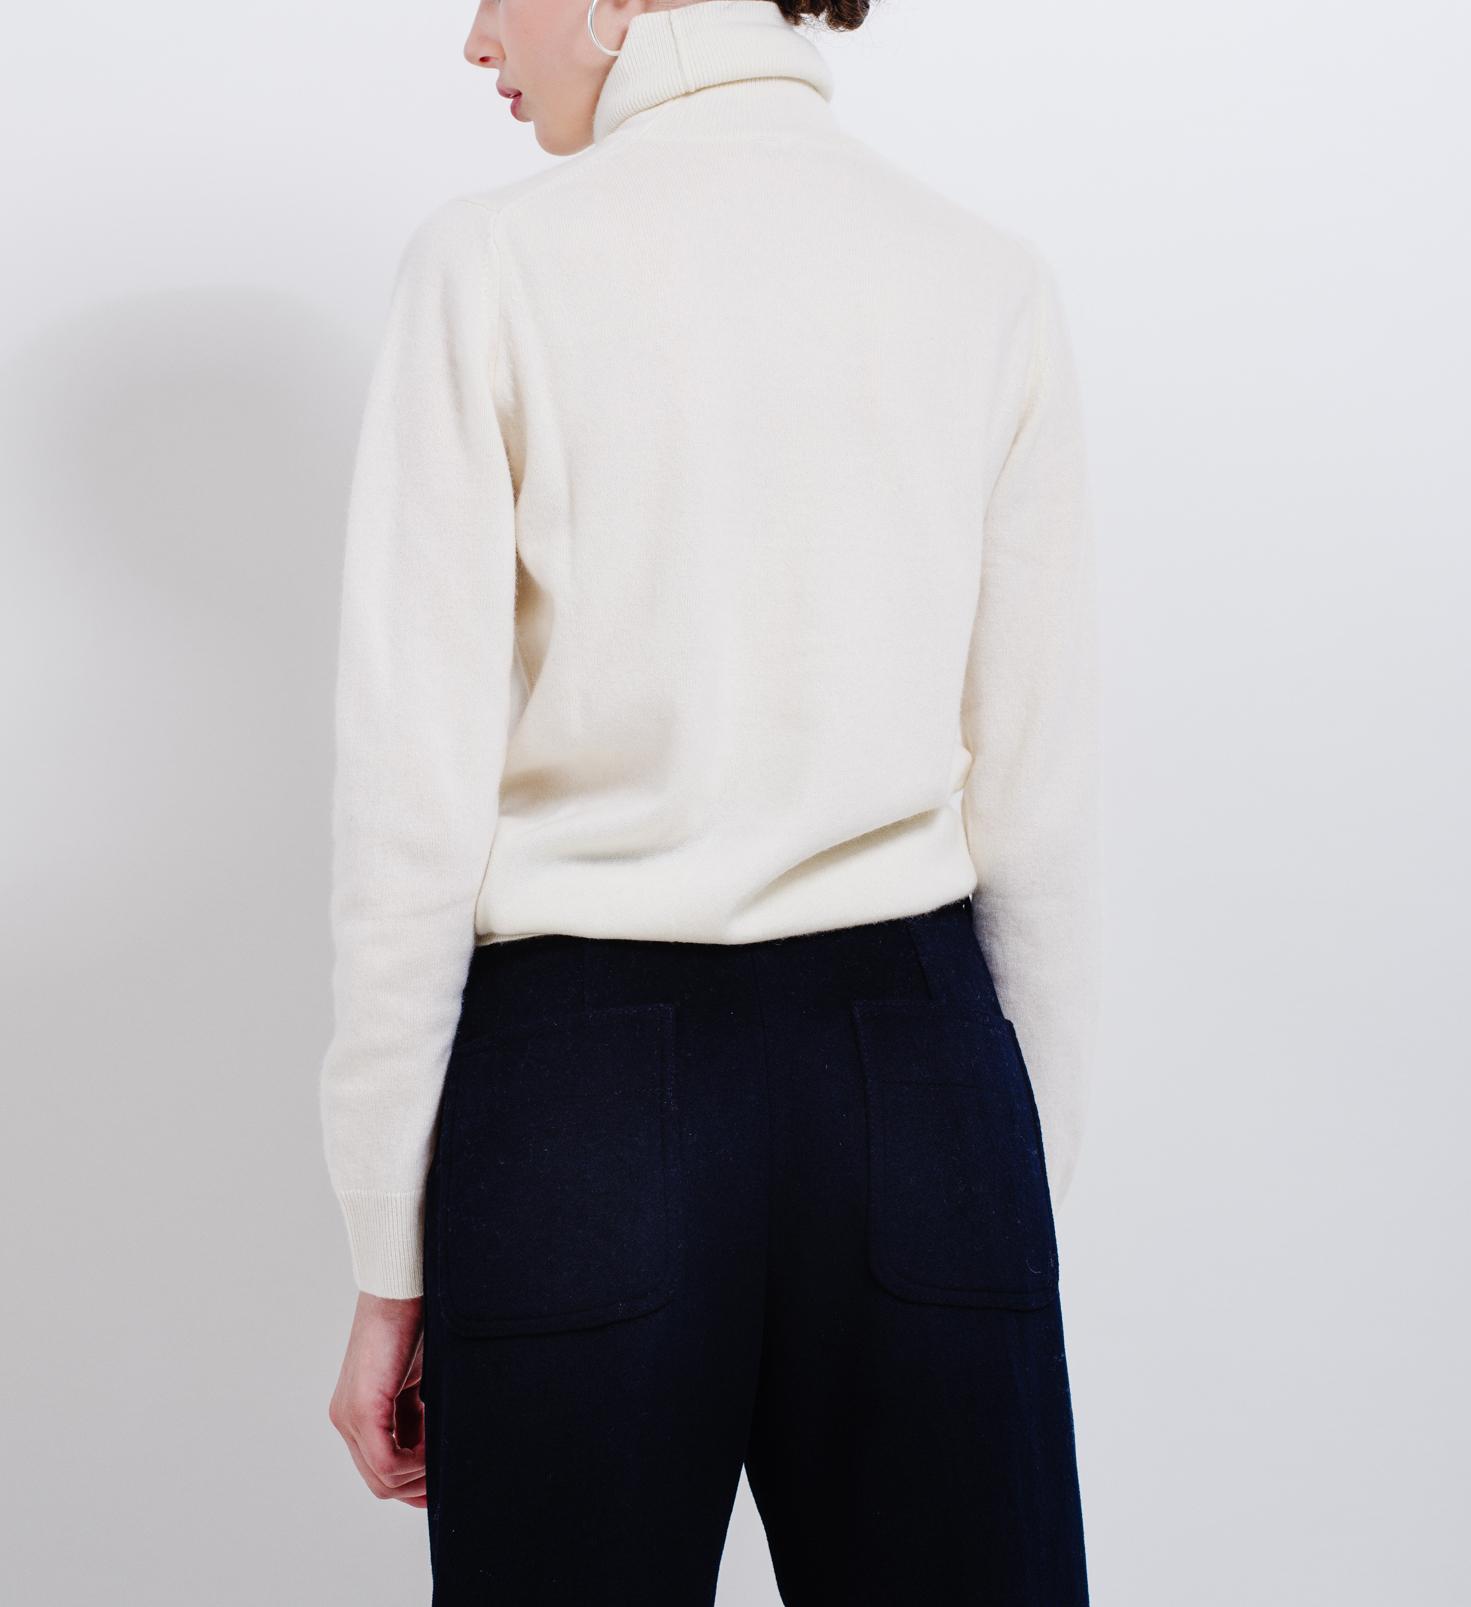 YONFA - Japanese fashion brand